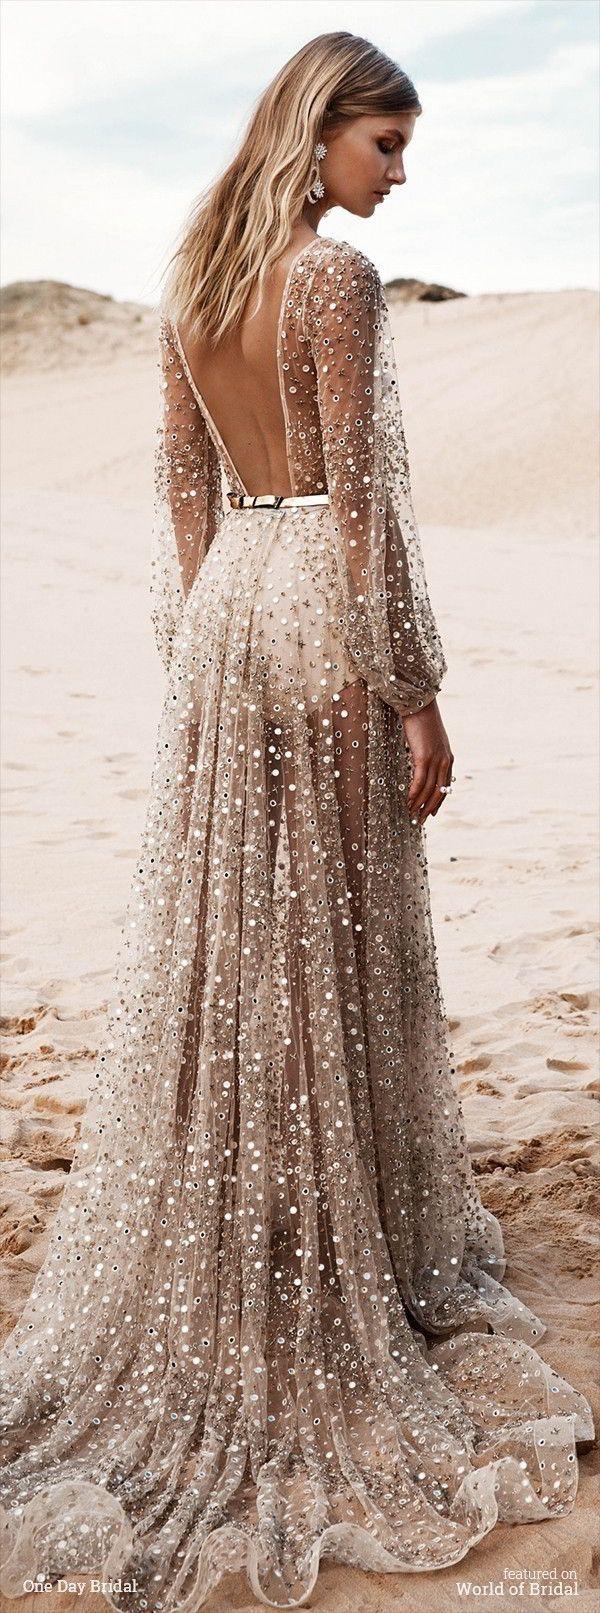 most beautiful dresses beige wedding dress CAMI Beige Blonde Hair Russet Brown Eyes Stunning Wedding Dresses